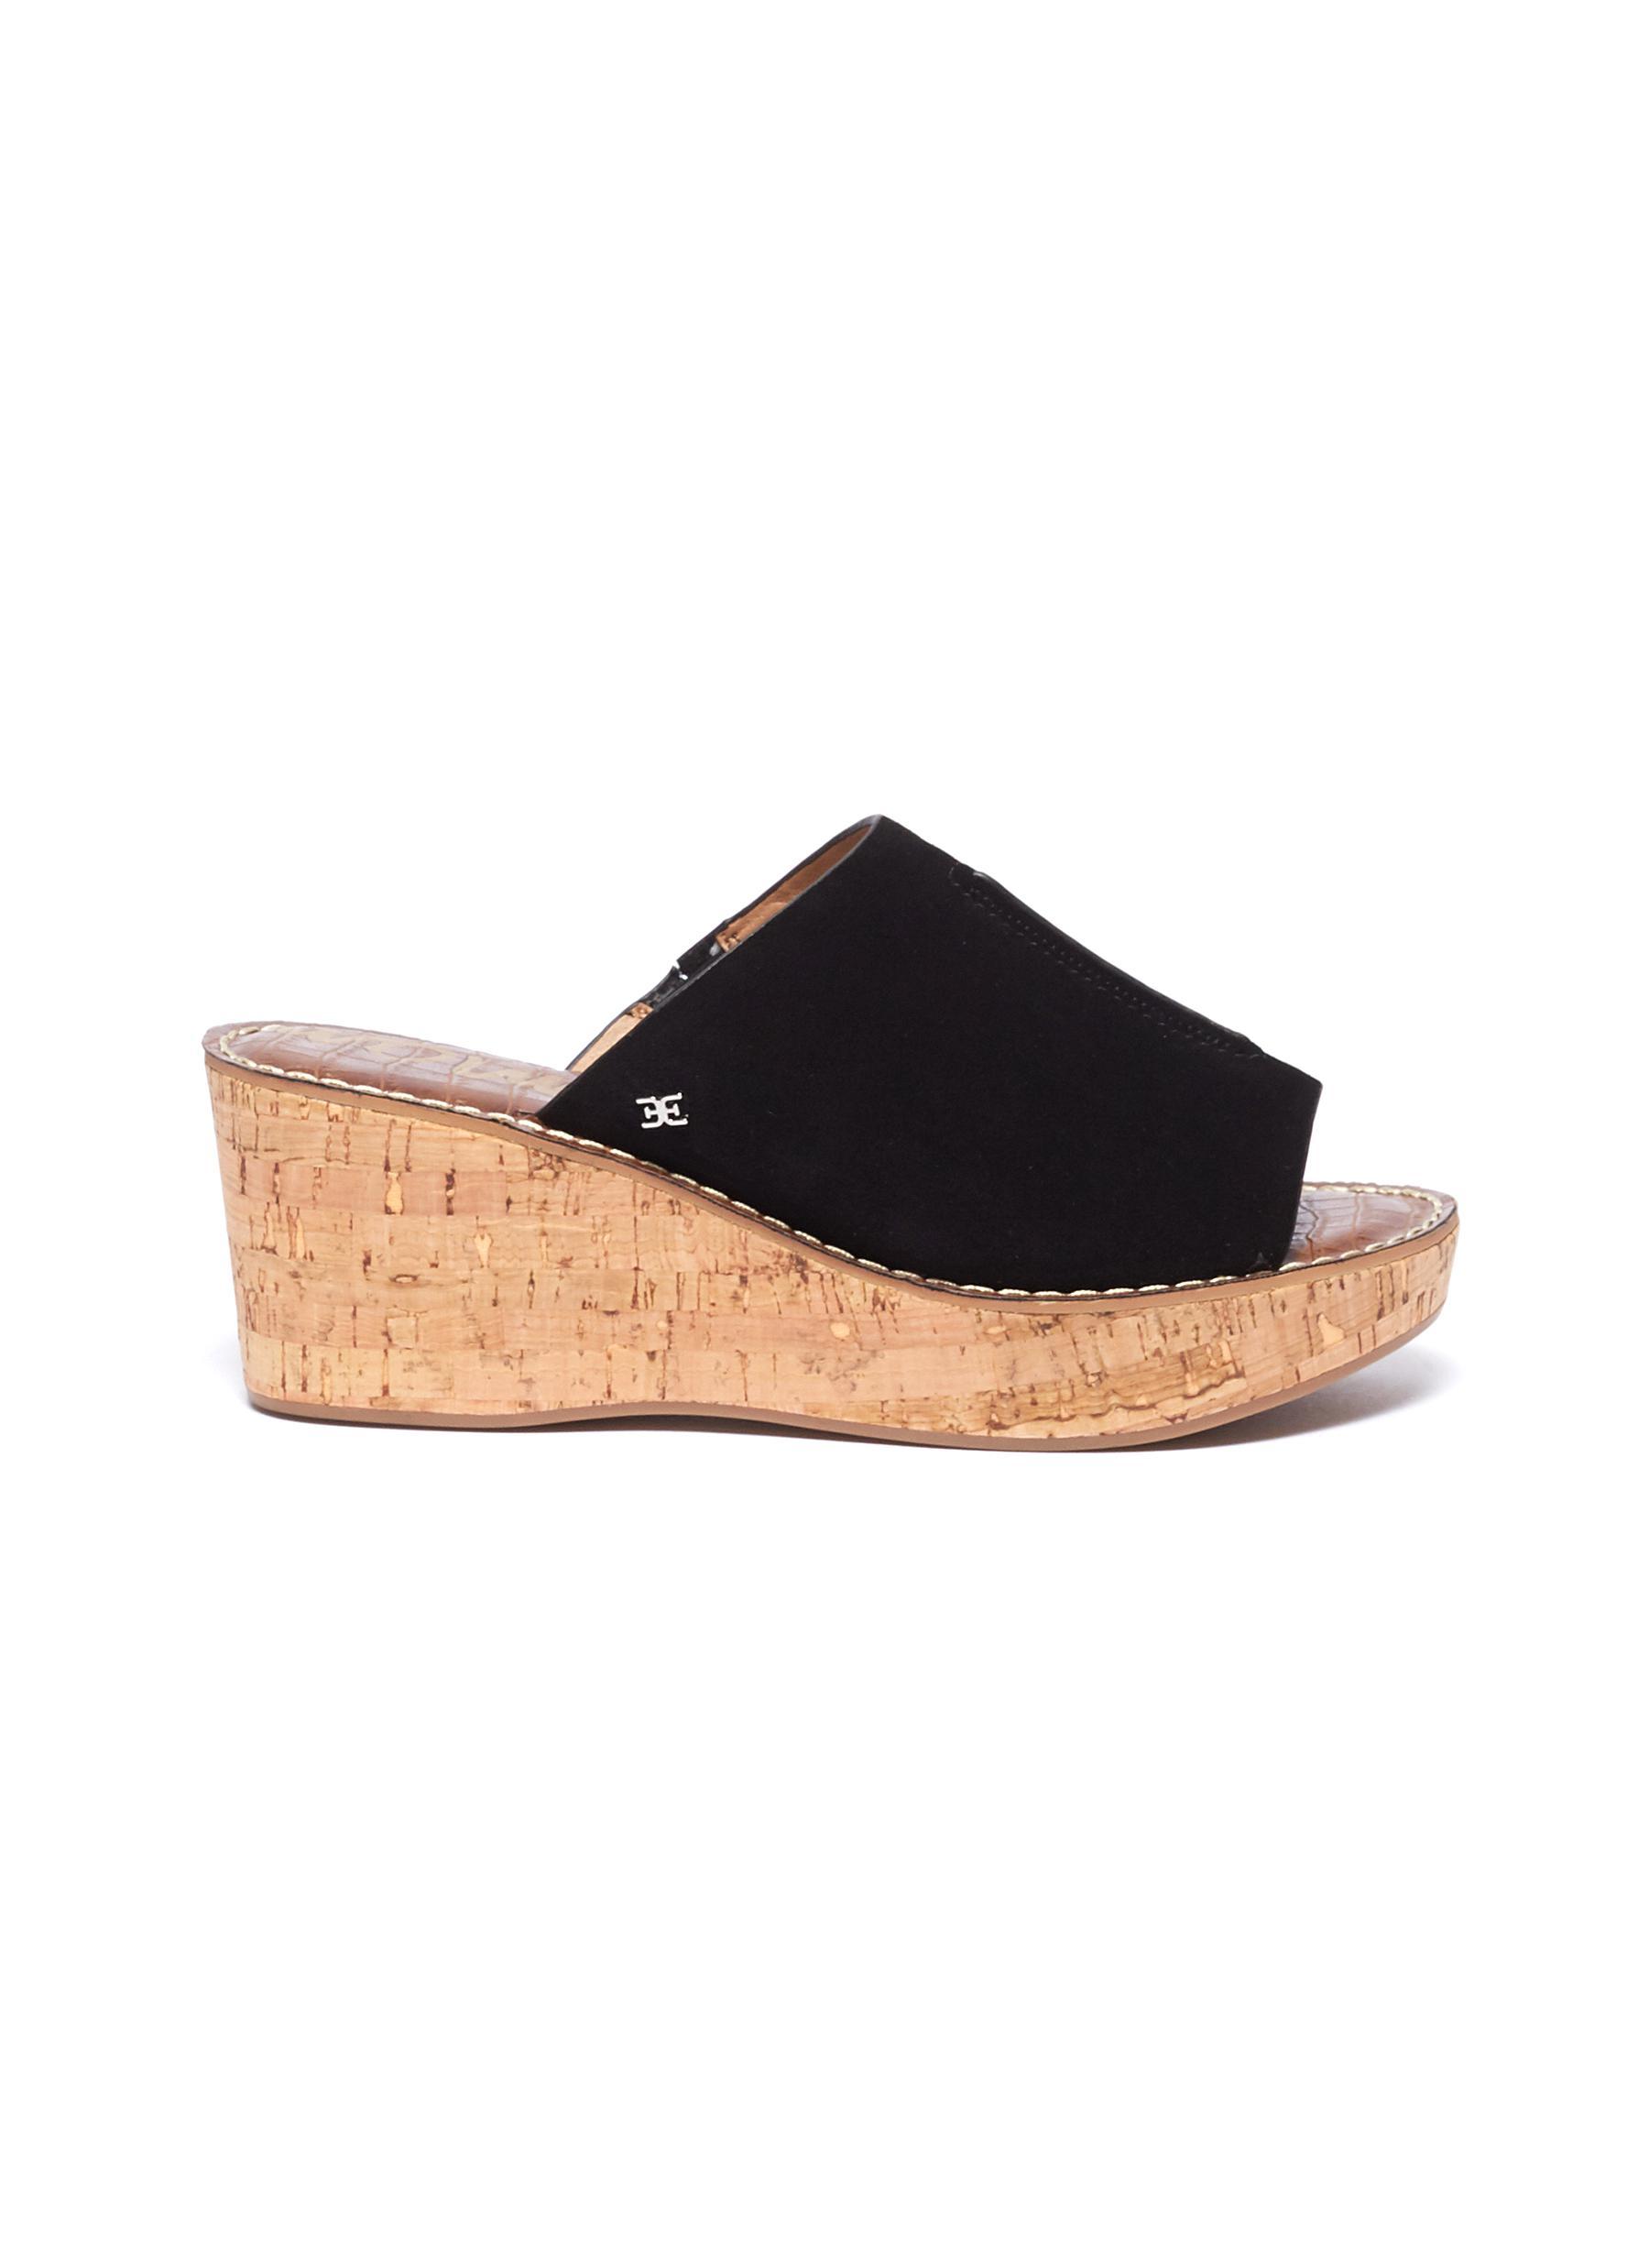 cce777d7b9e Sam Edelman.  Ranger  suede cork wedge sandals